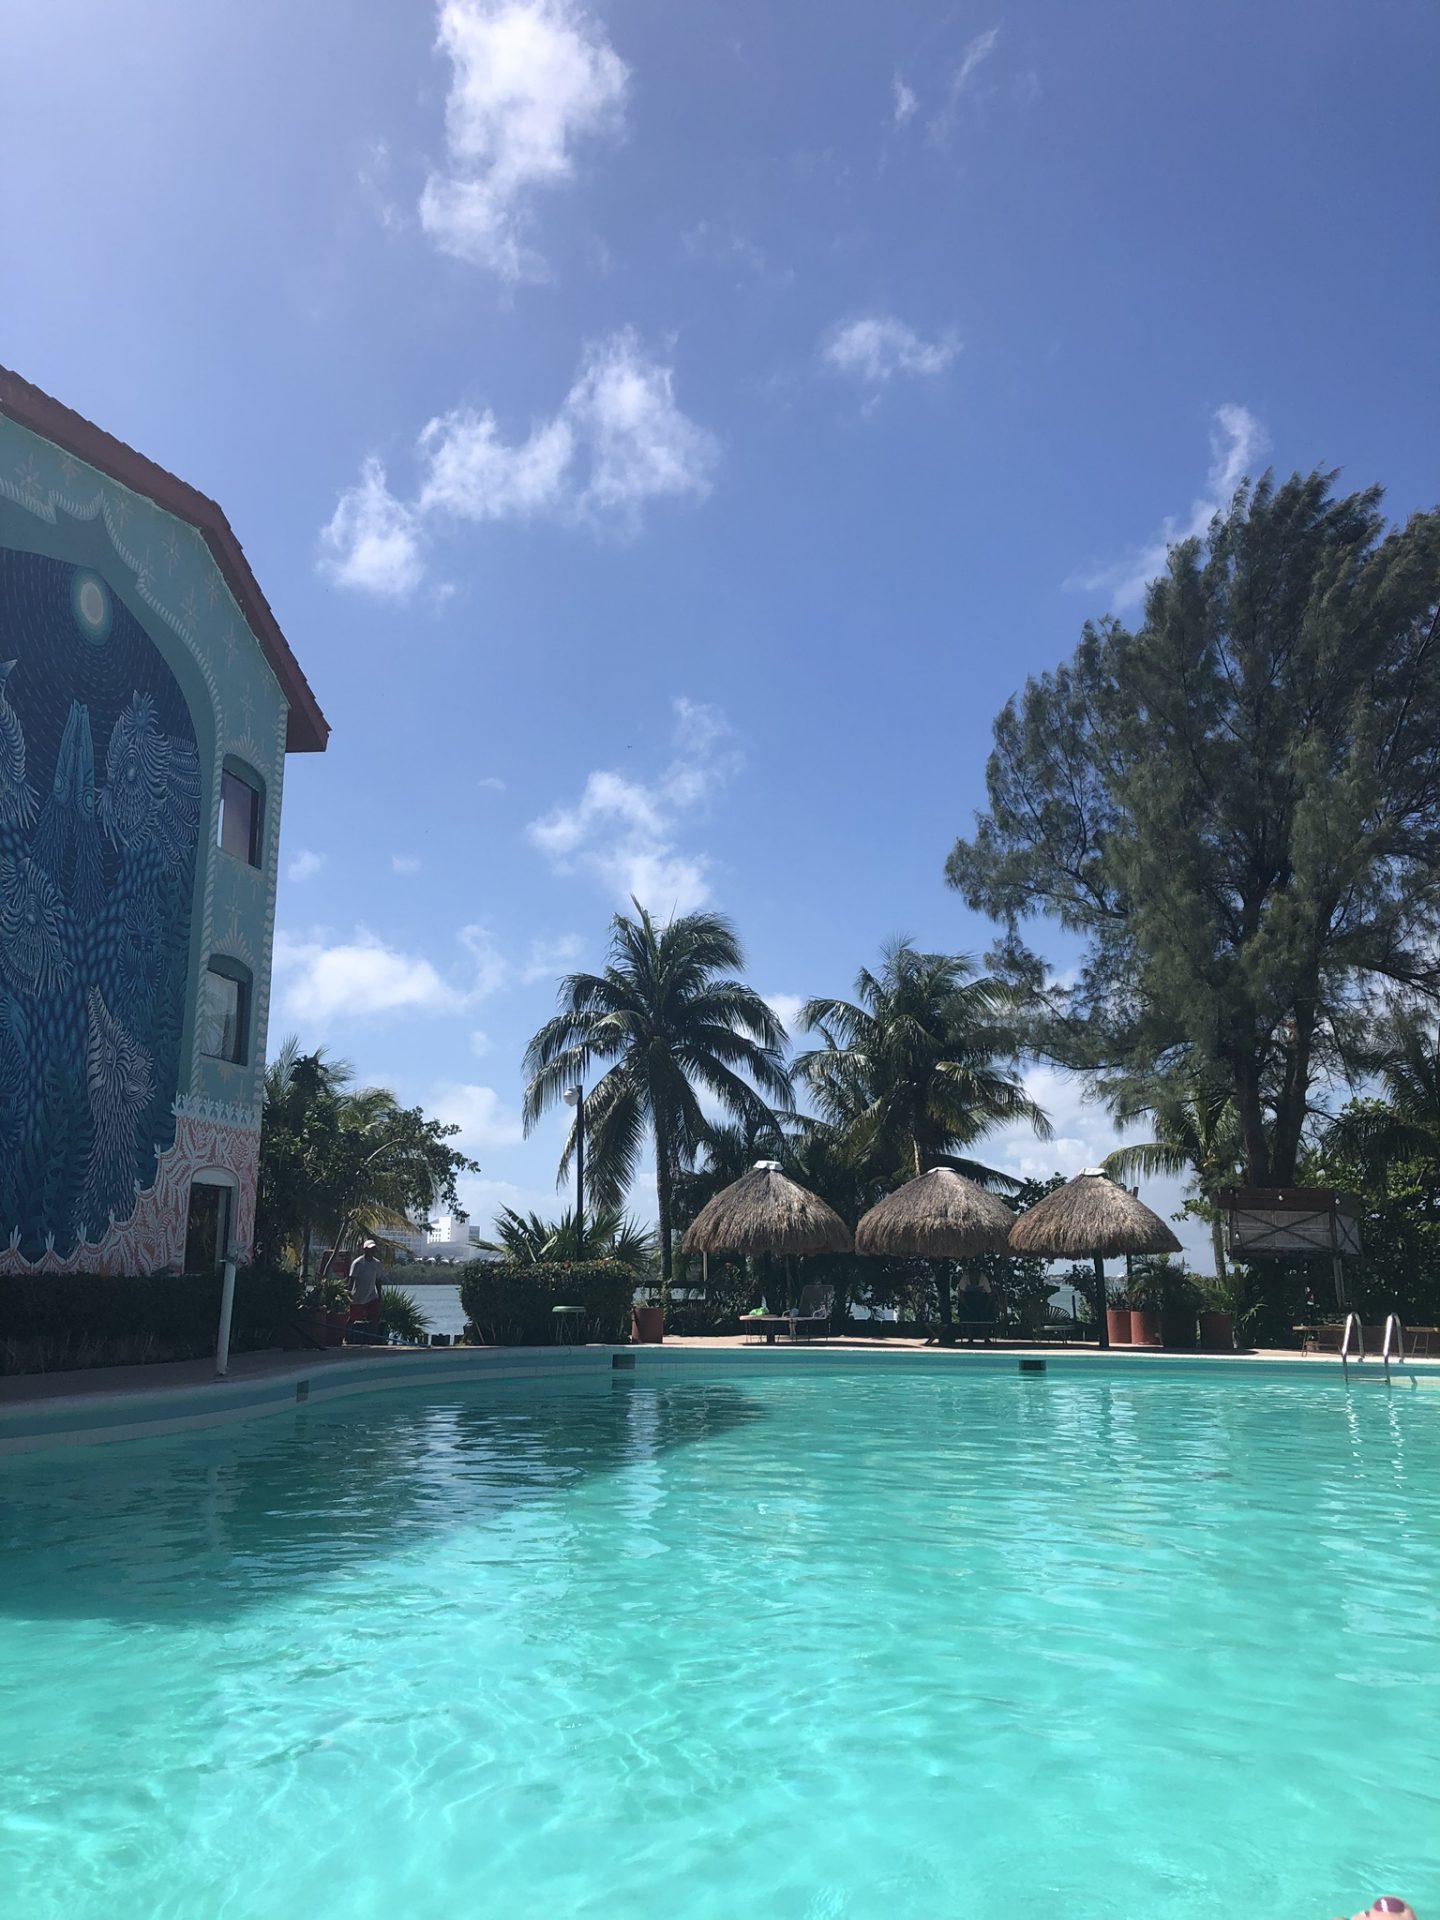 The pool at Selina, Cancun